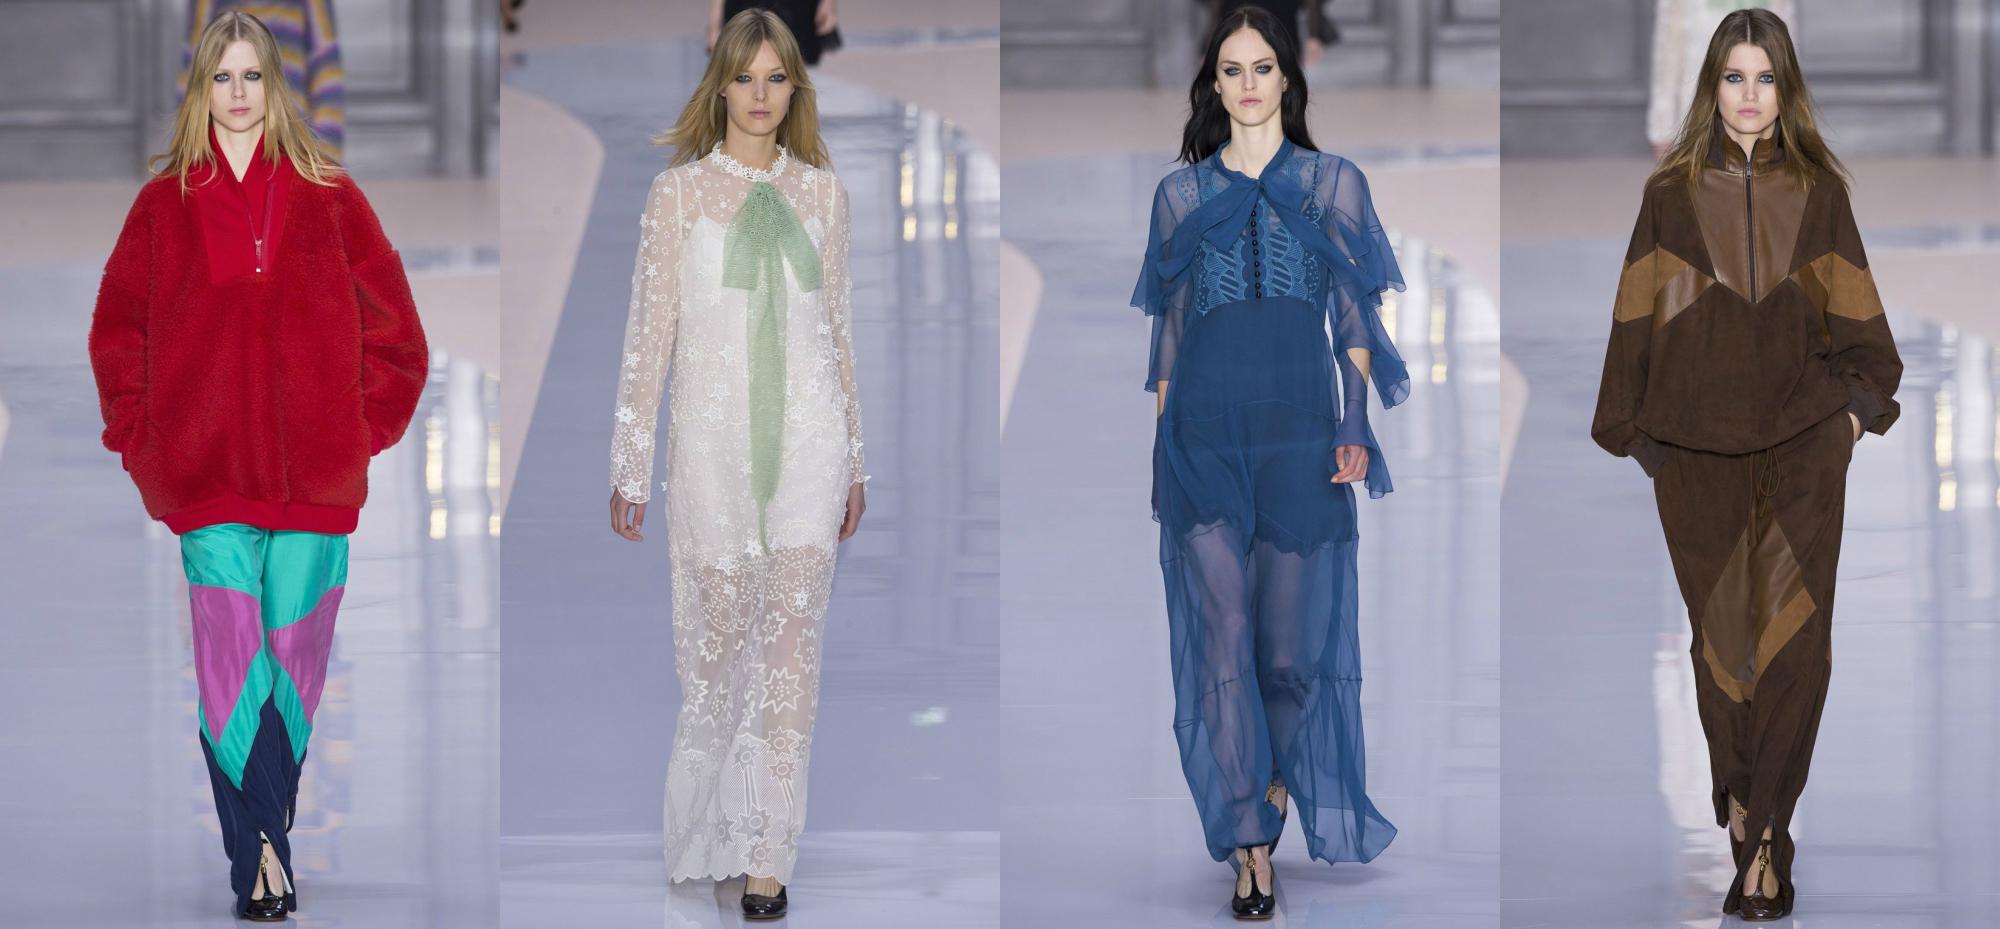 Chloe Осень-Зима 2017 Модные тенденции